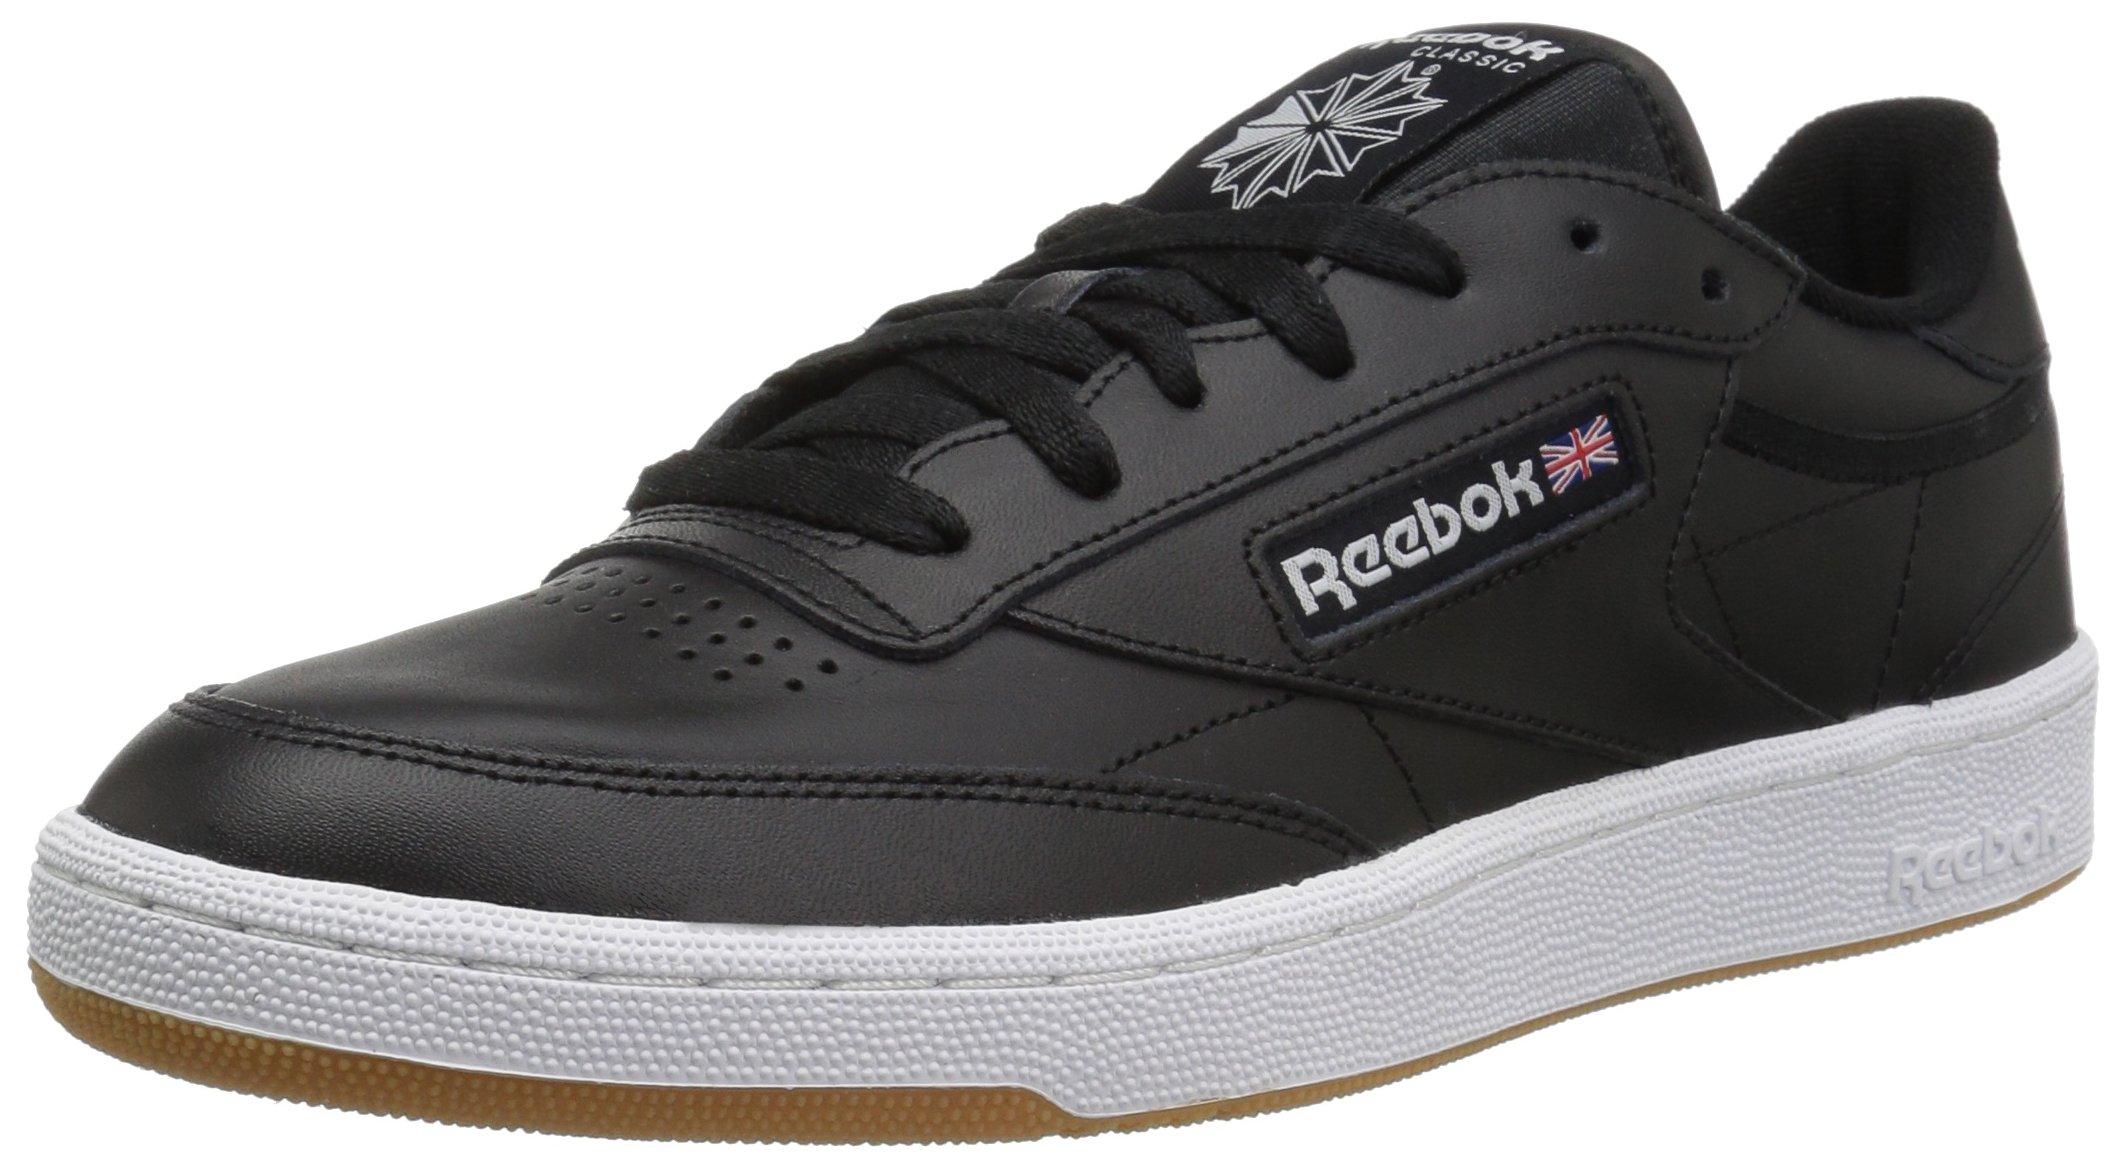 c799ecdb99f8 Get Quotations · Reebok Men s Club C 85 Fashion Sneaker